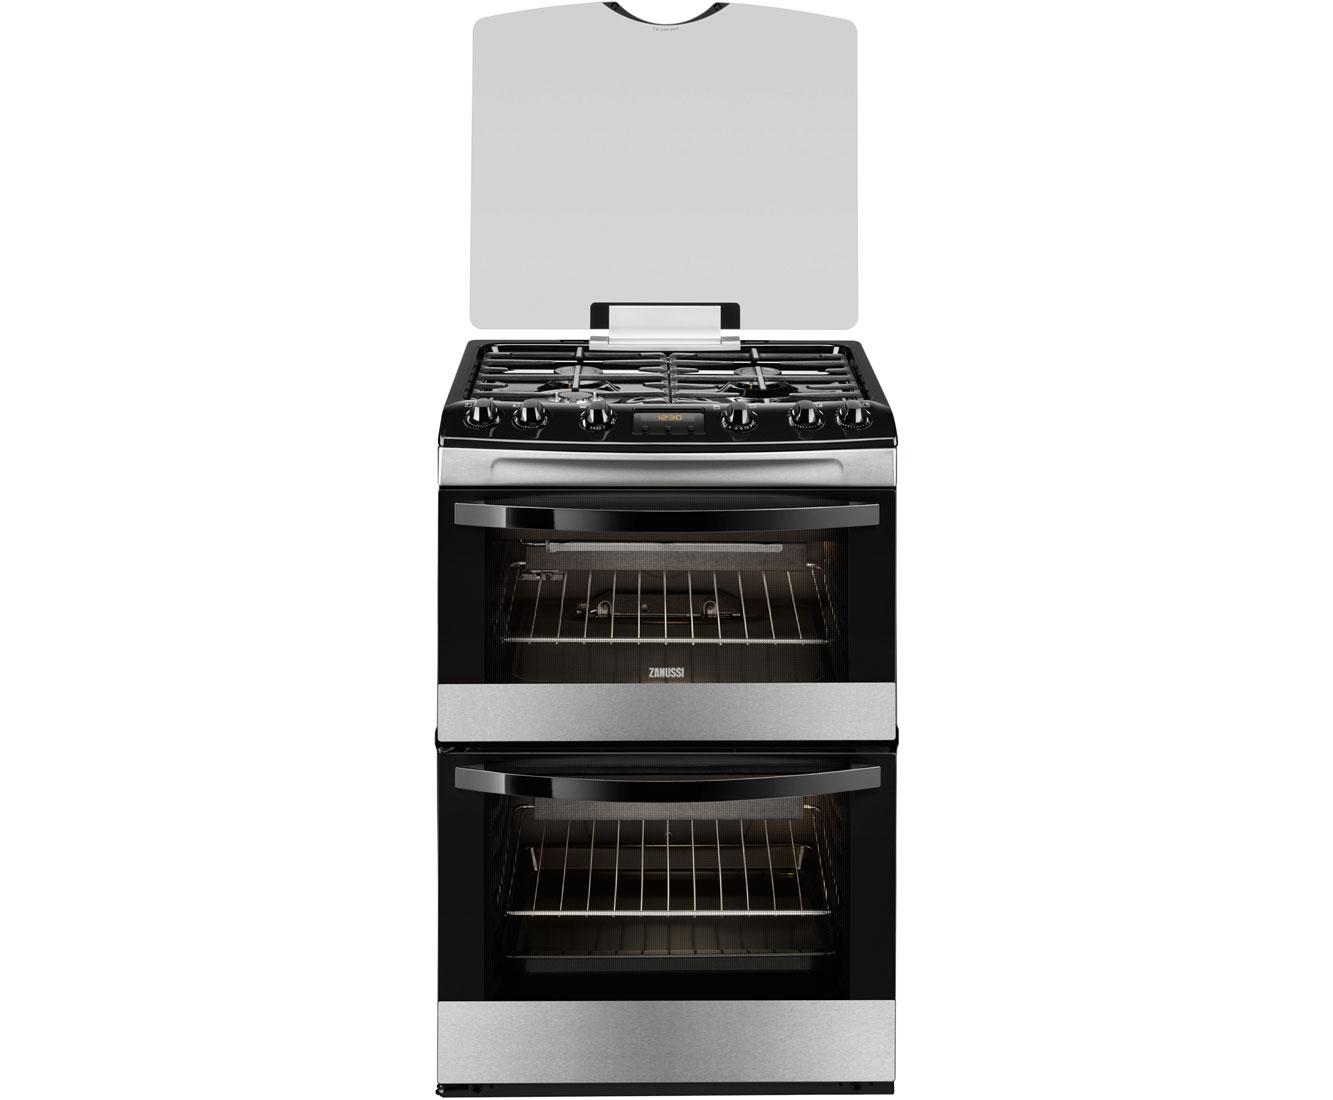 Uncategorized Zanussi Kitchen Appliances zcg63200xa ss zanussi gas cooker ao com